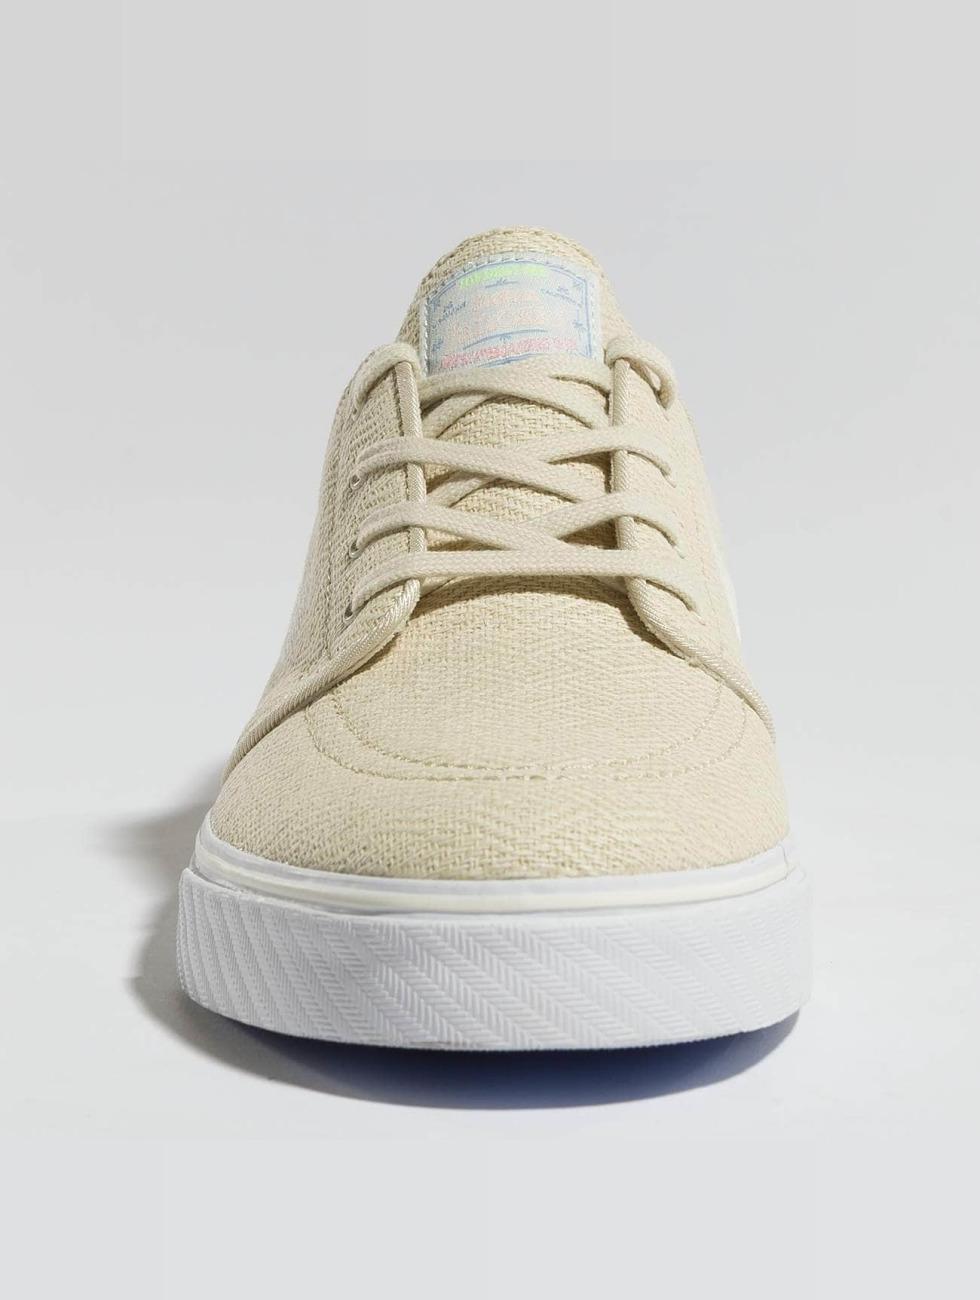 Nike Toile Chaussures / Baskets Sb Zoom Stefan Janoski Beige 442 643 Original Livraison Gratuite OK3C4vZkJ